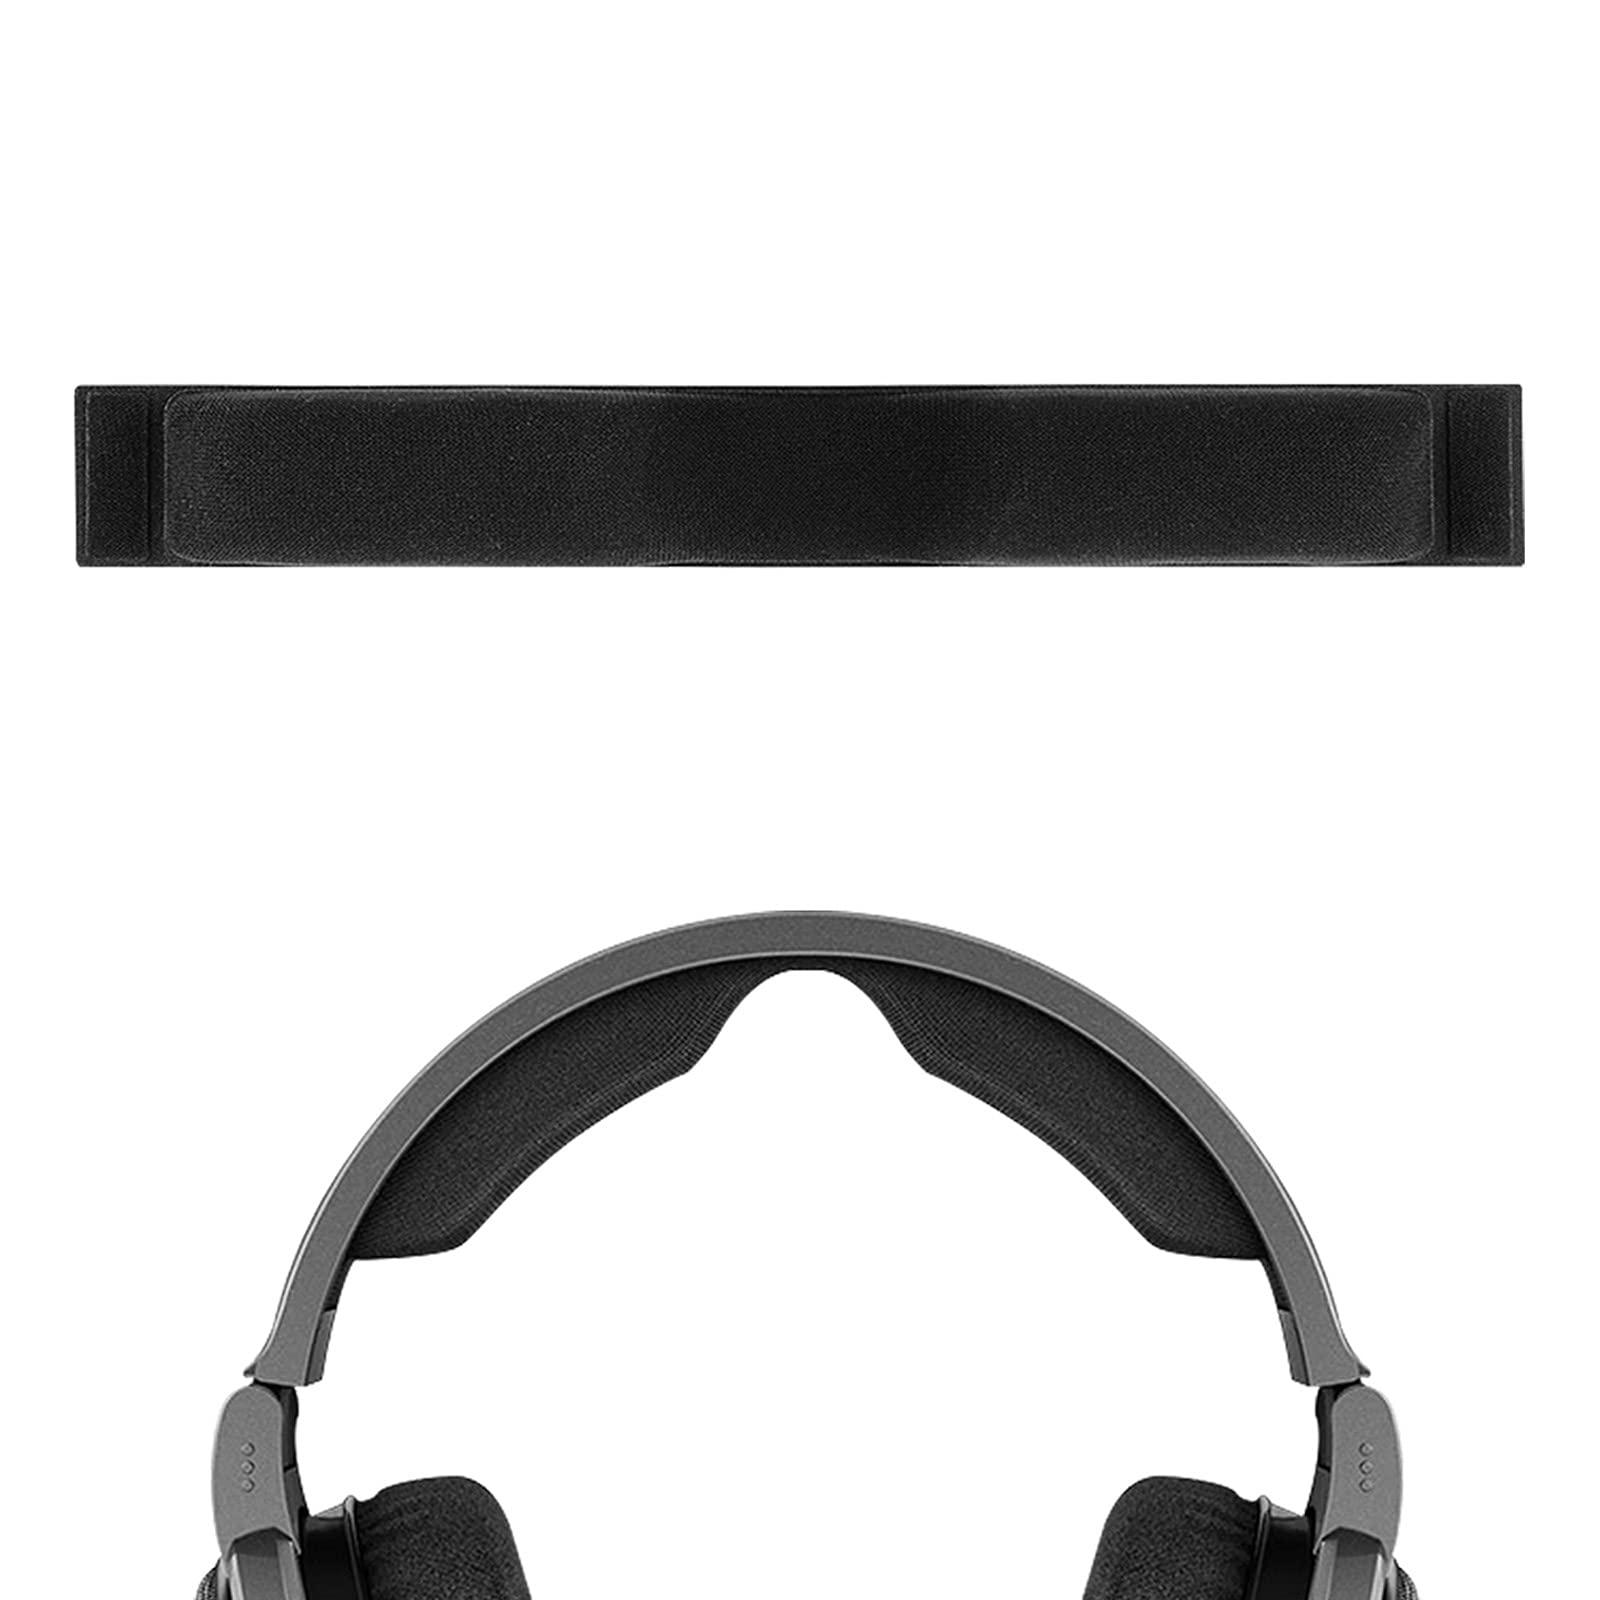 Geekria Mesh Fabric Headband Pad Compatible with Sennheiser HD650, HD660 S, HD6XX Headphone Replacement Headband/Headband Cushion/Replacement Pad Repair Parts (Black).